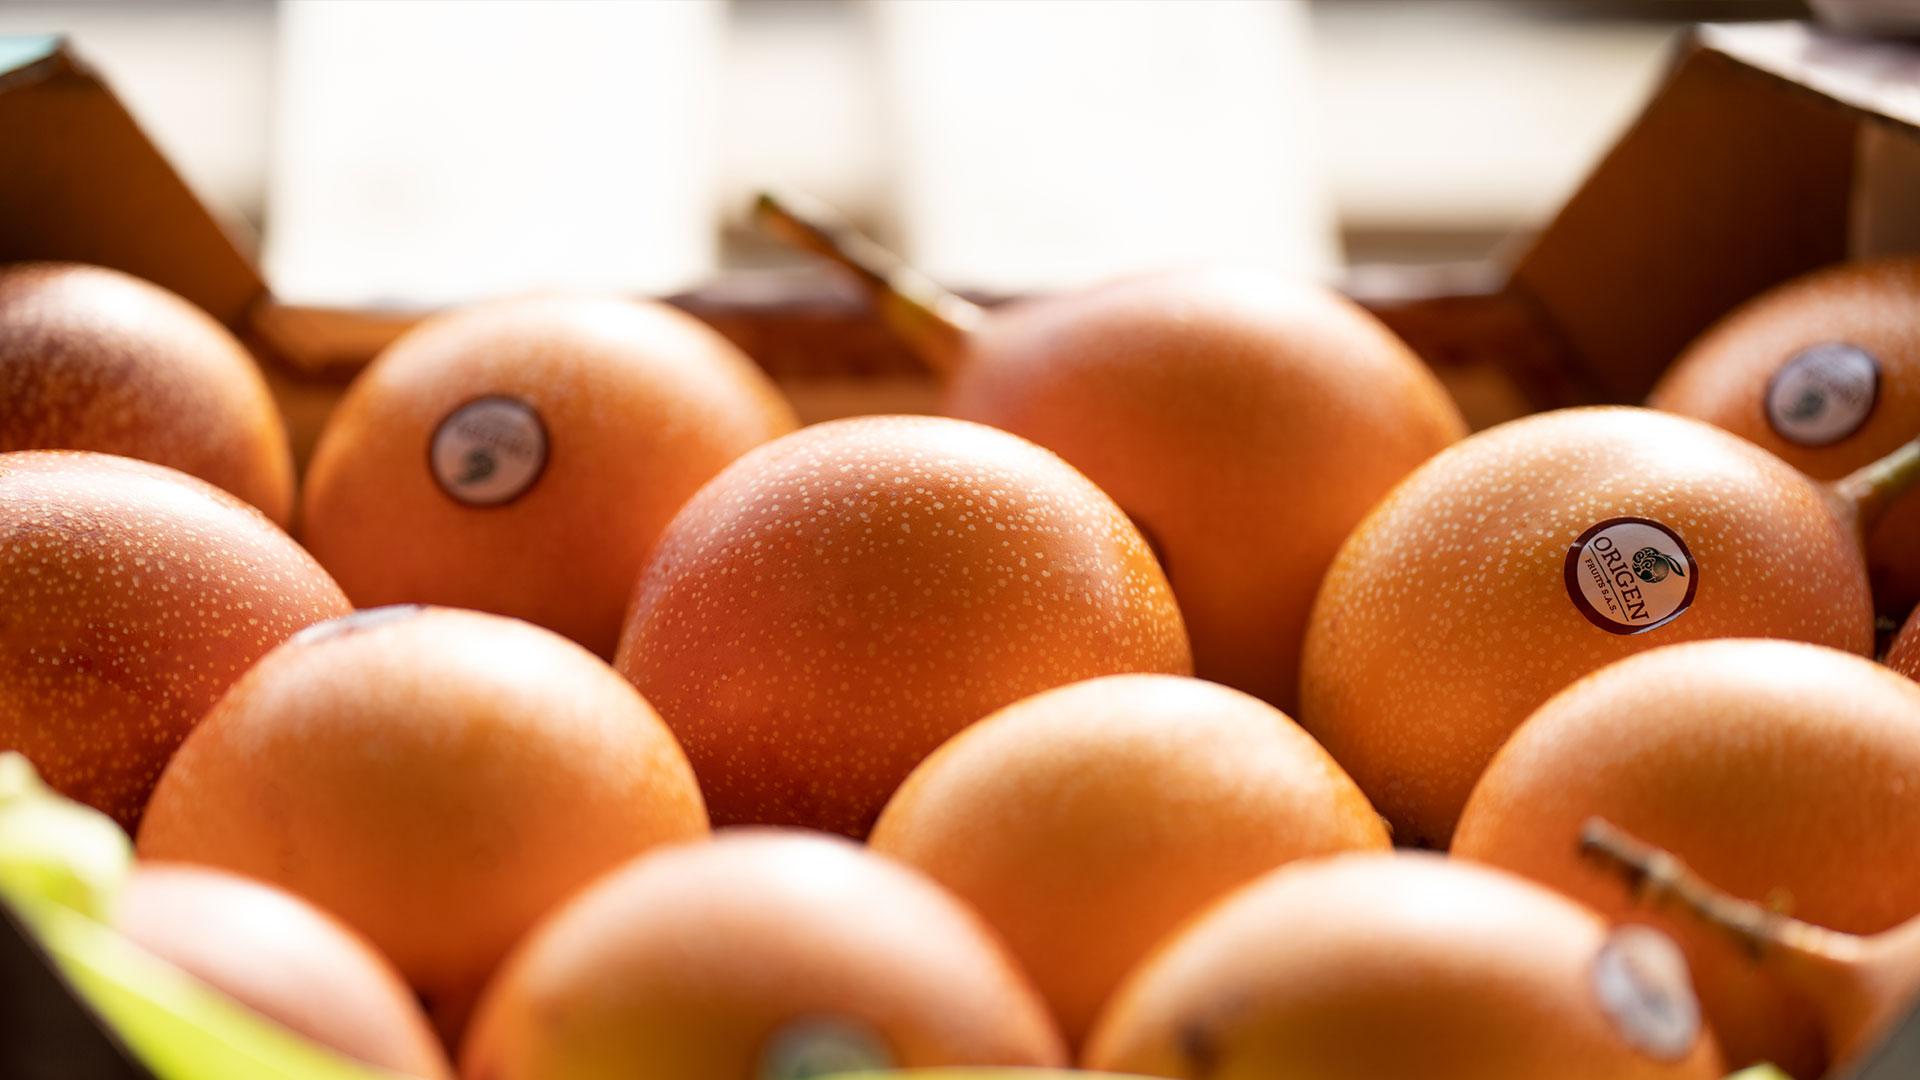 Frutta tropicale import export Due Erre Padova